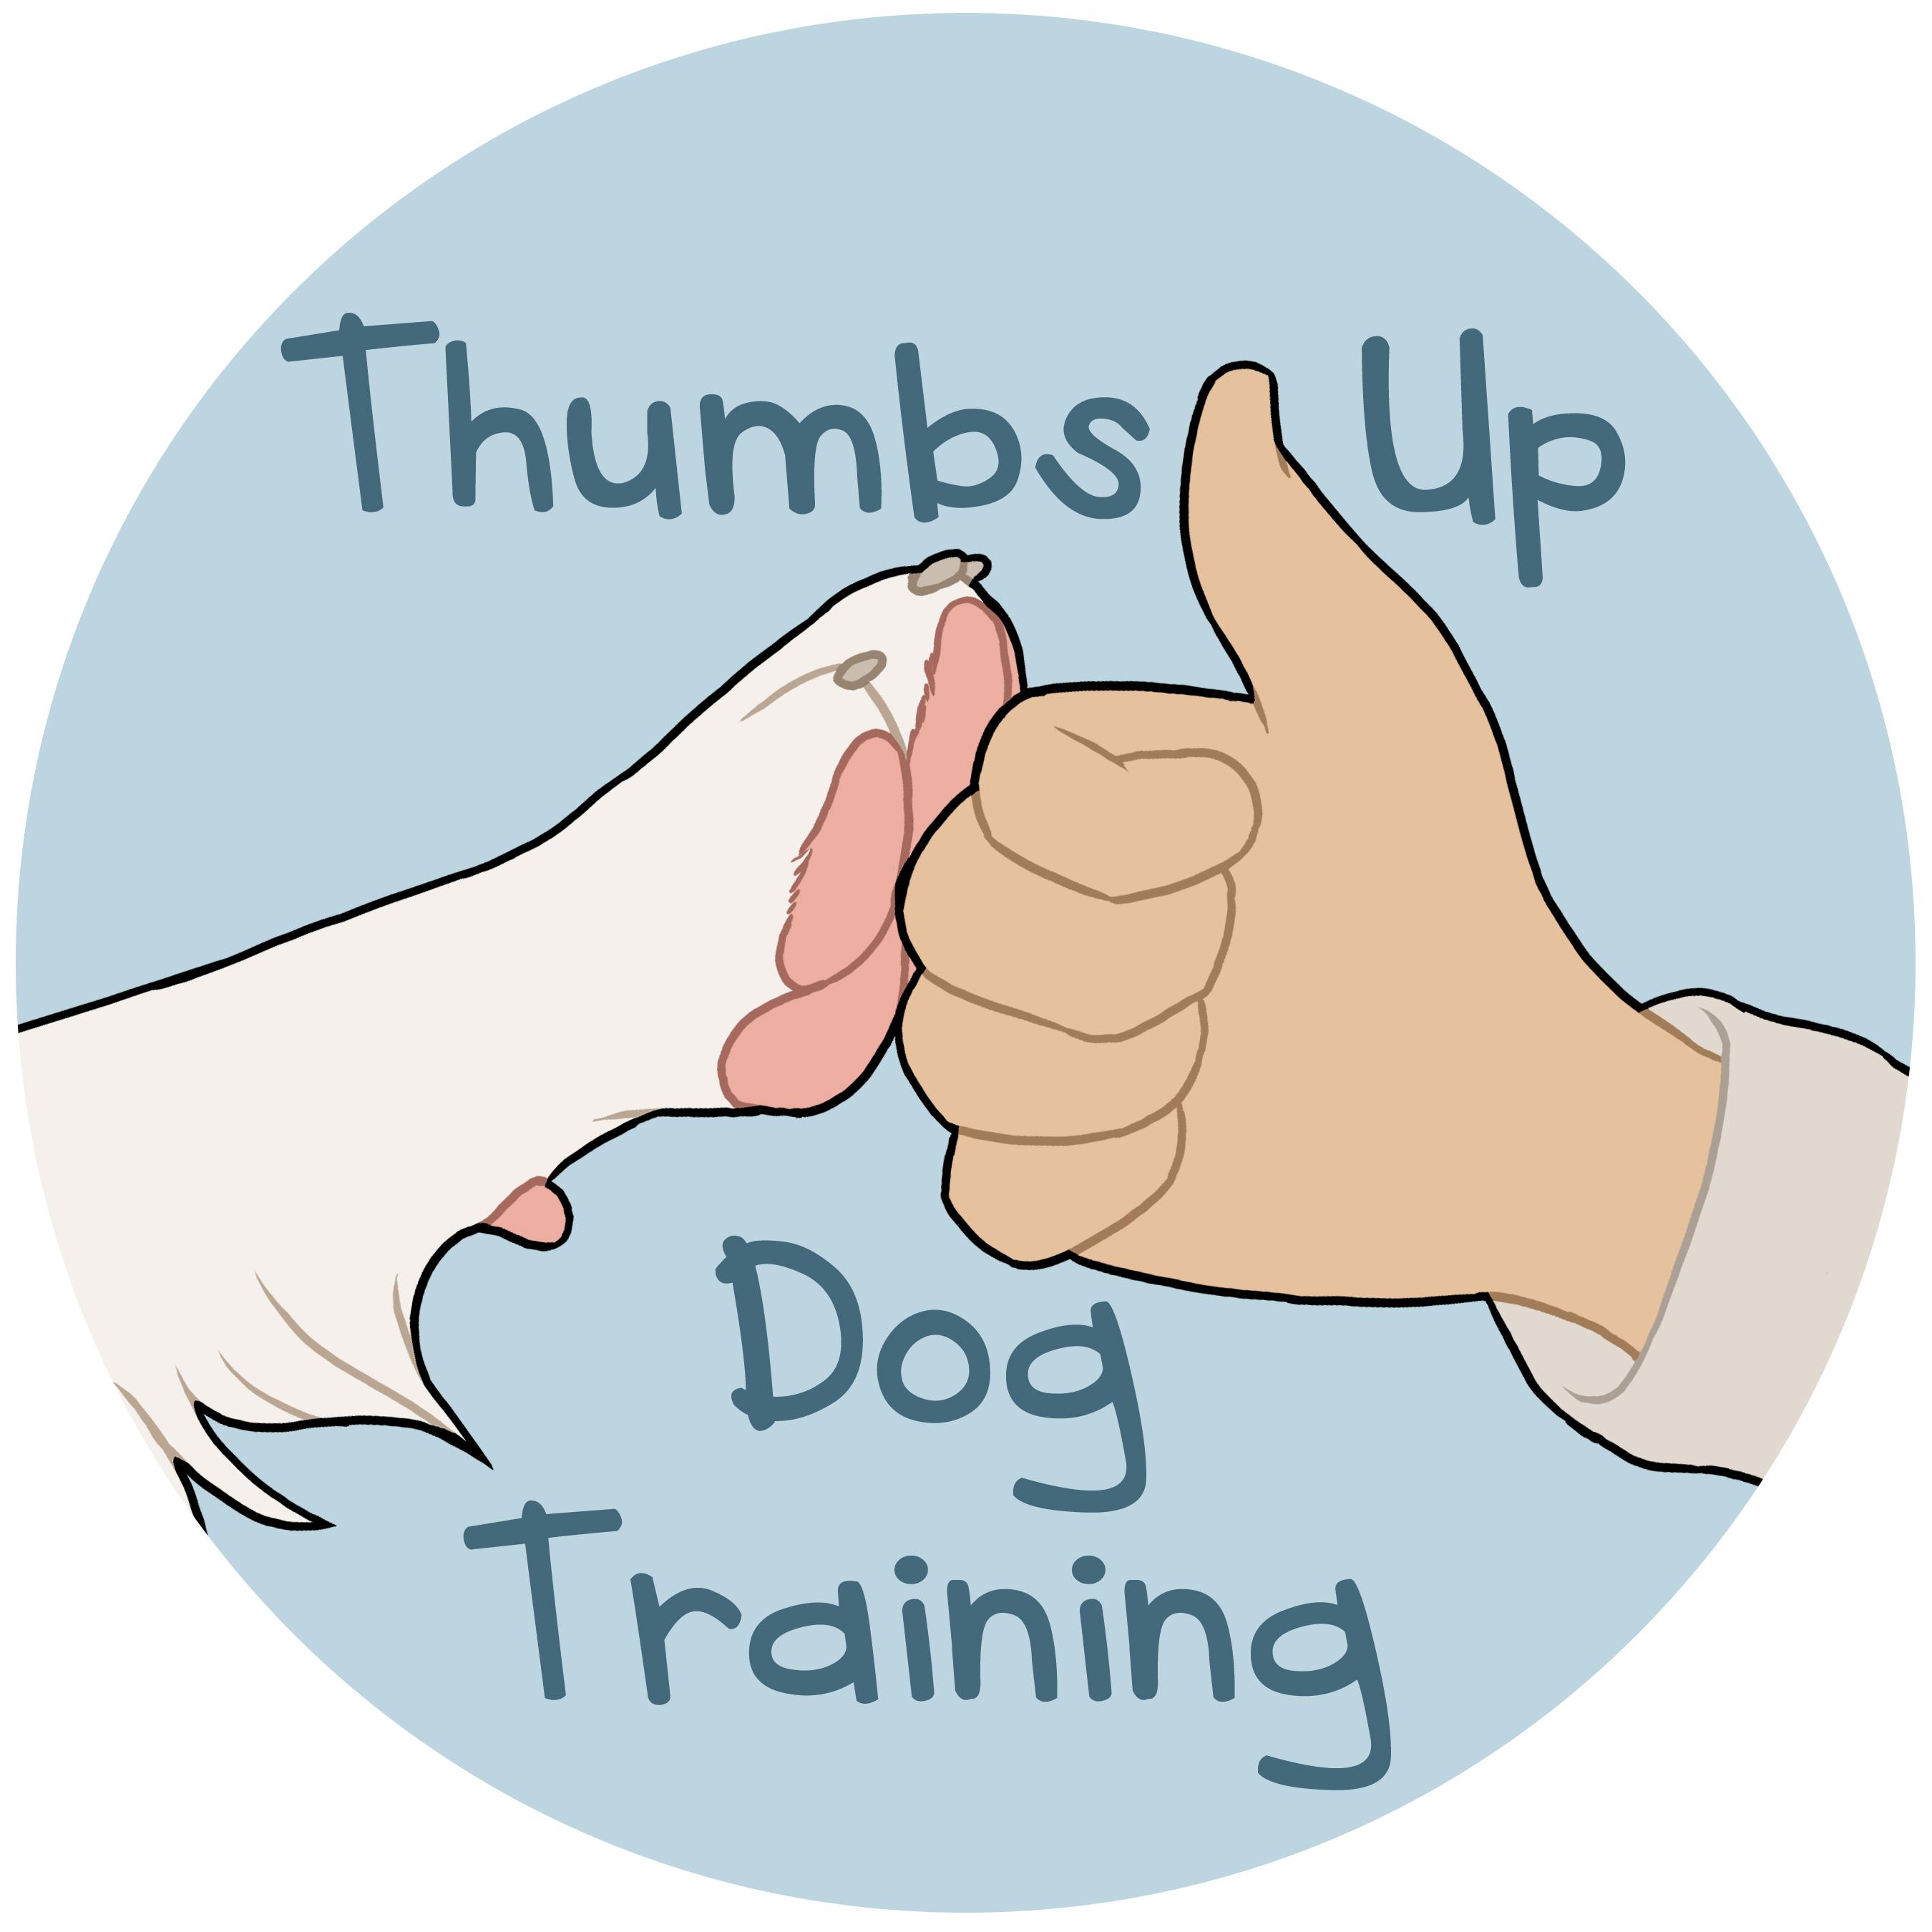 thumbs up training3